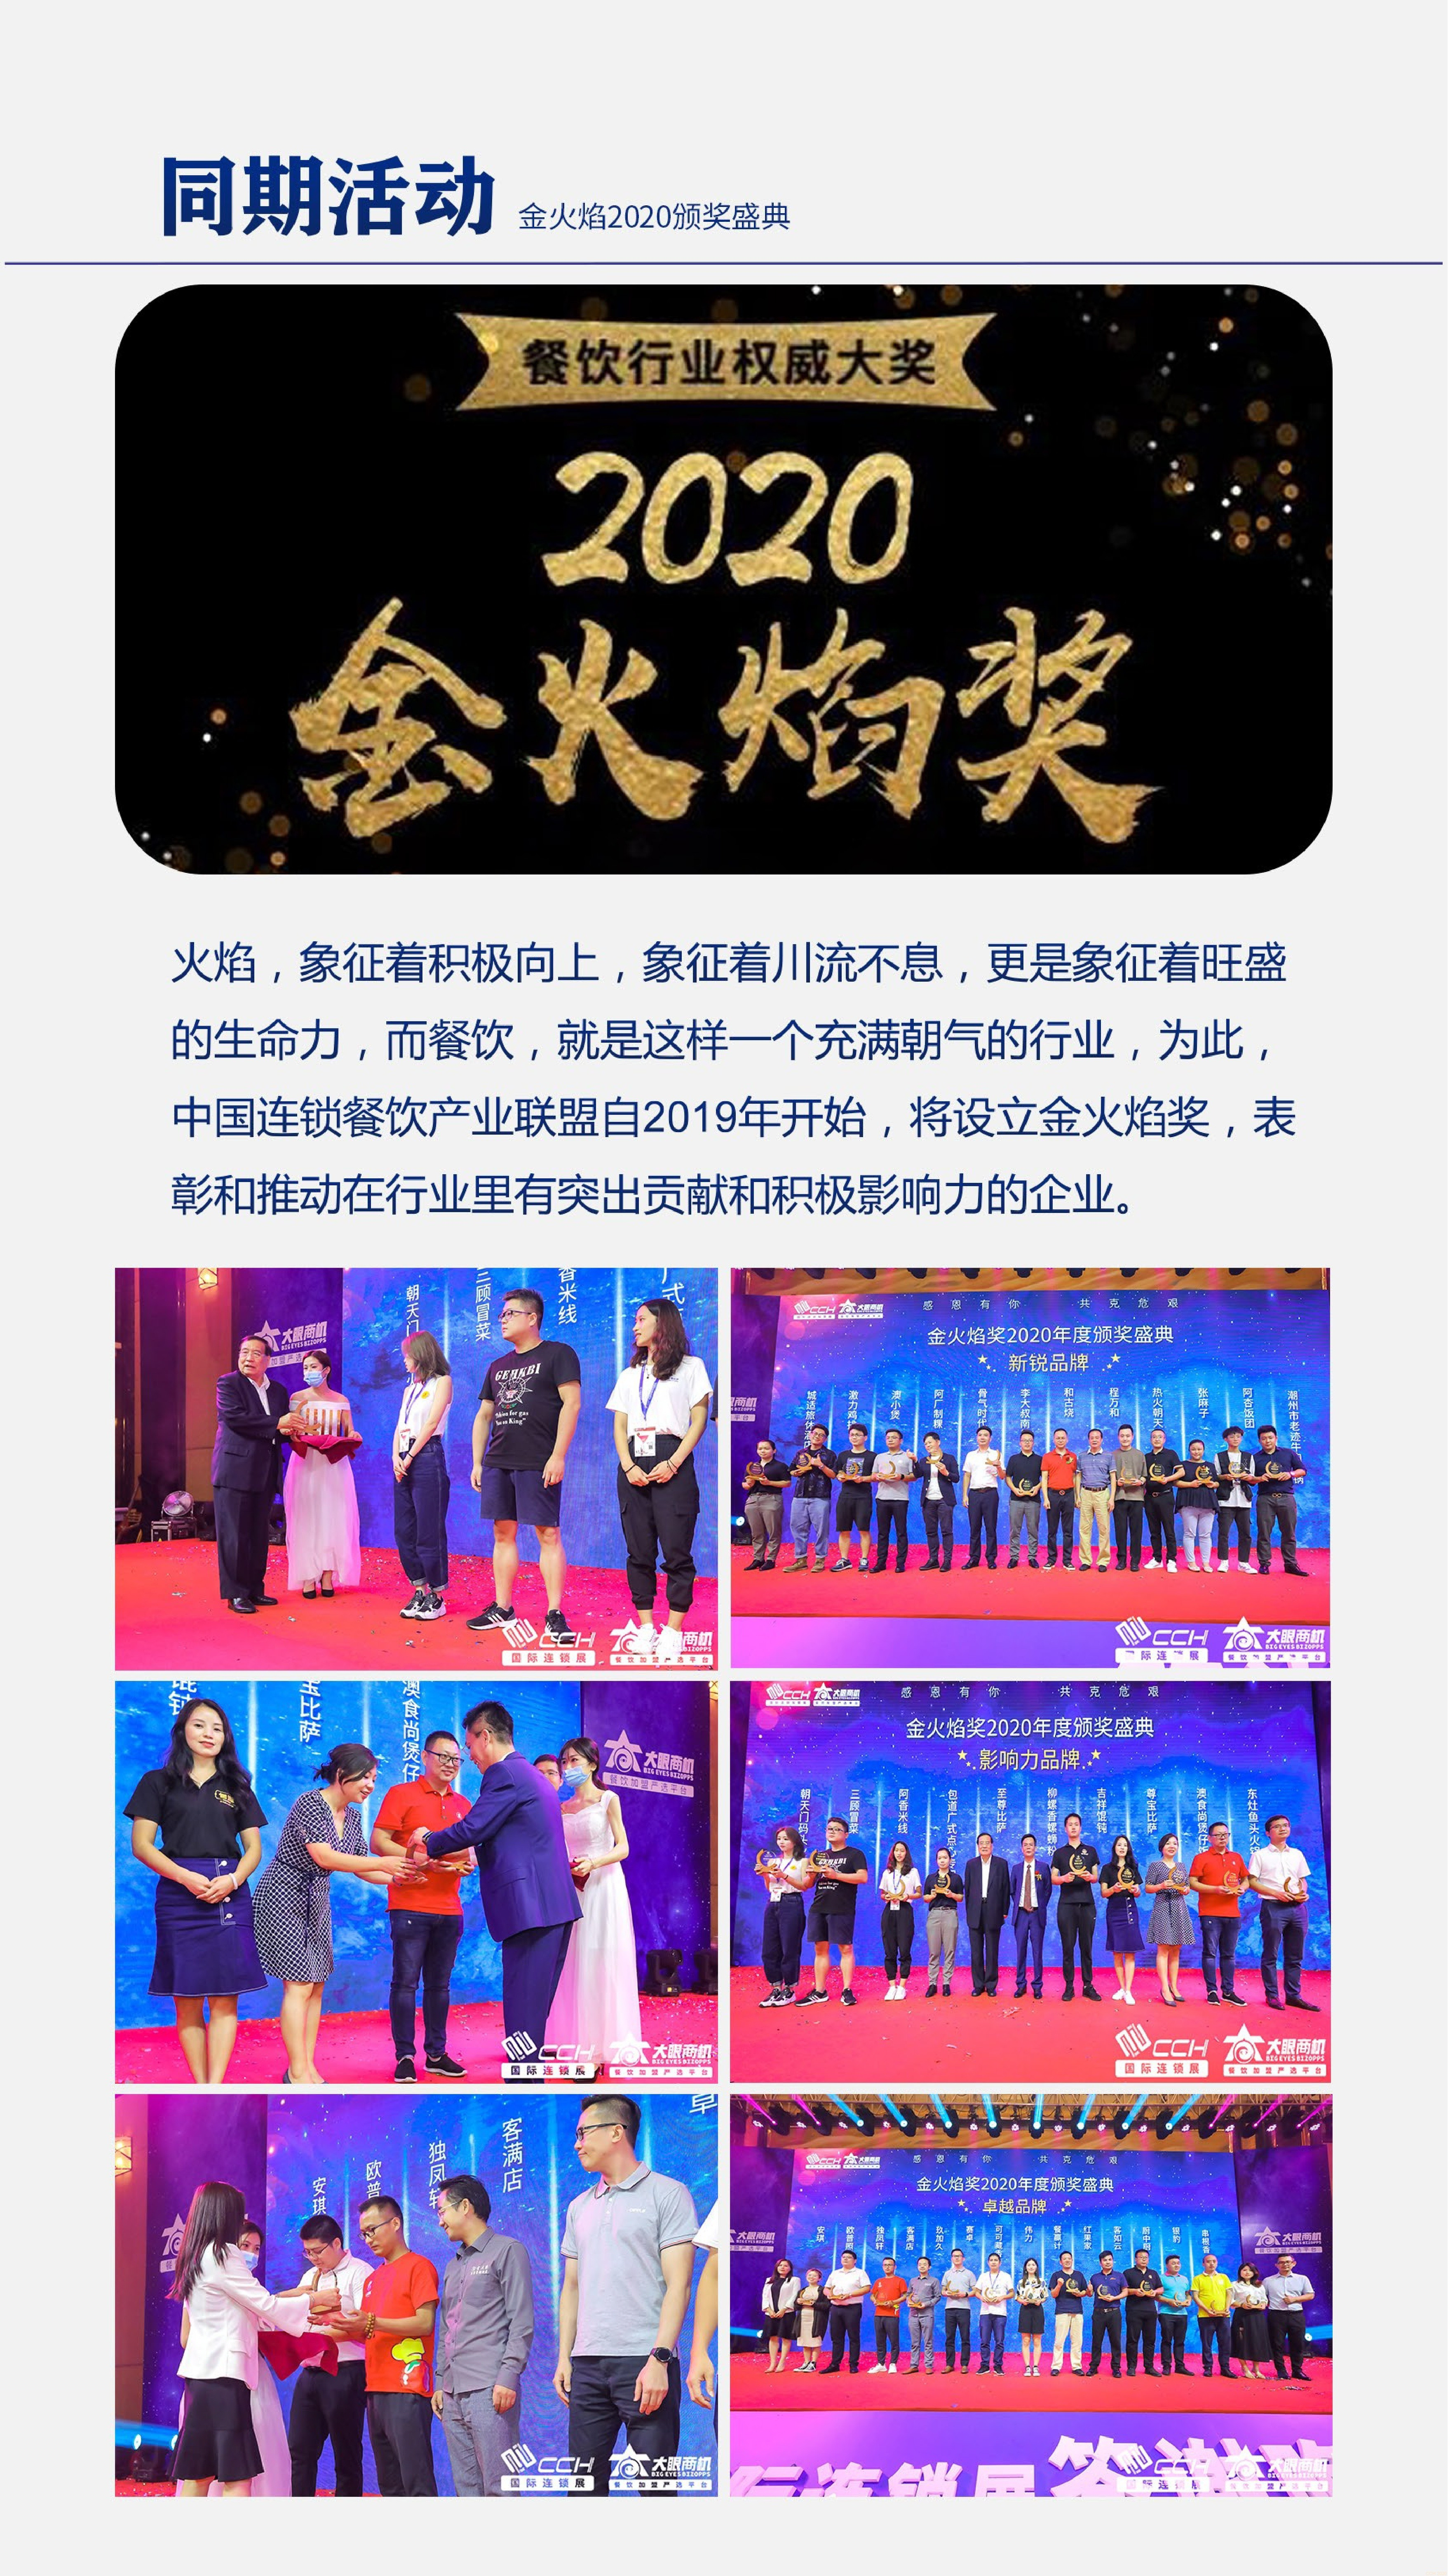 CCH2021-餐饮邀请函·赵(2)(1)-015.jpg